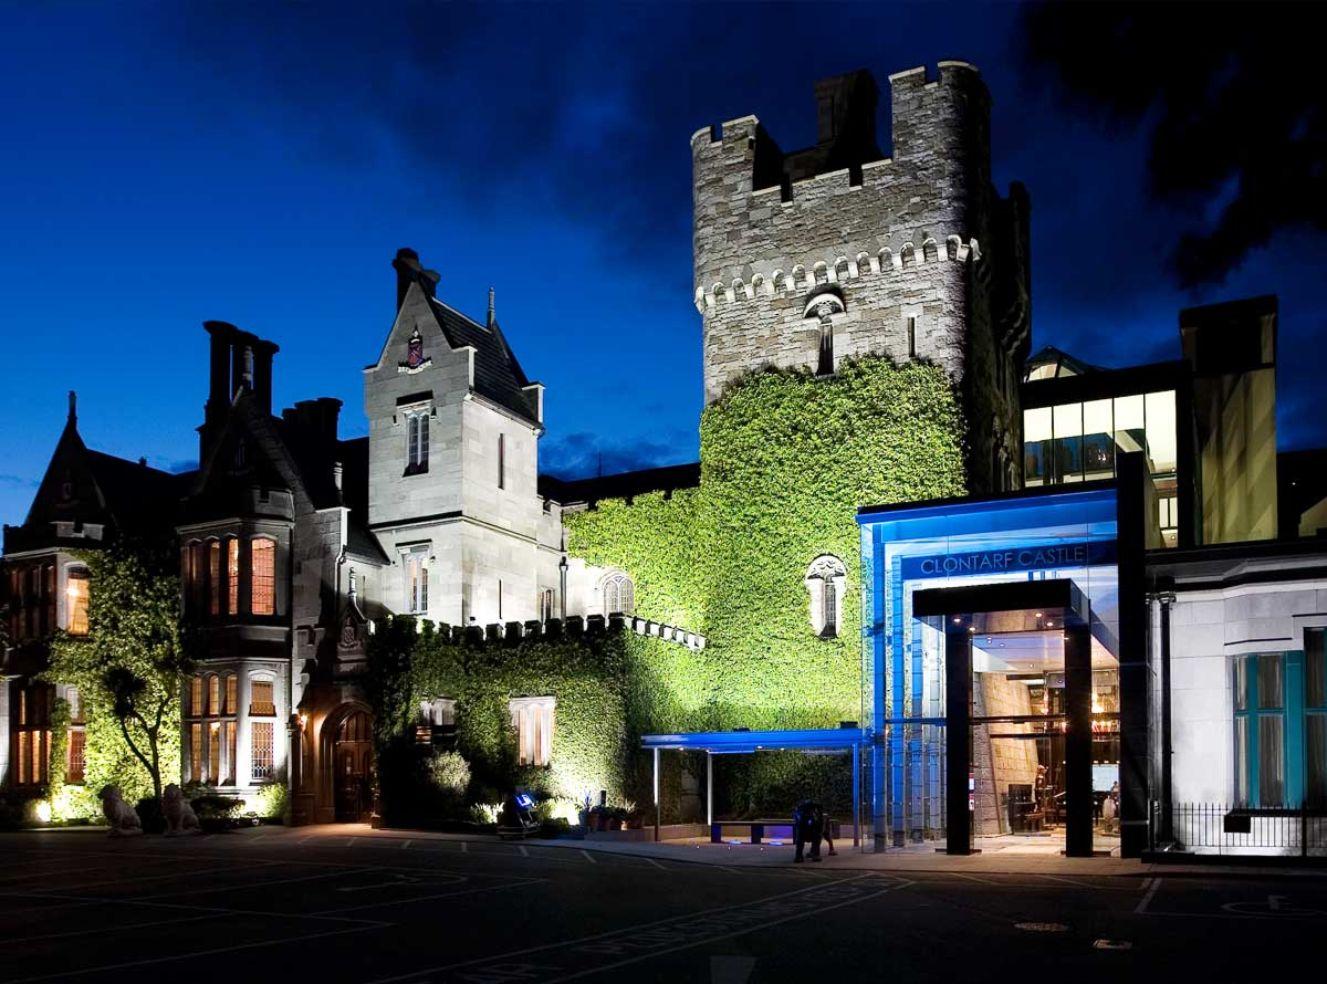 Ireland's Clontarf Castle